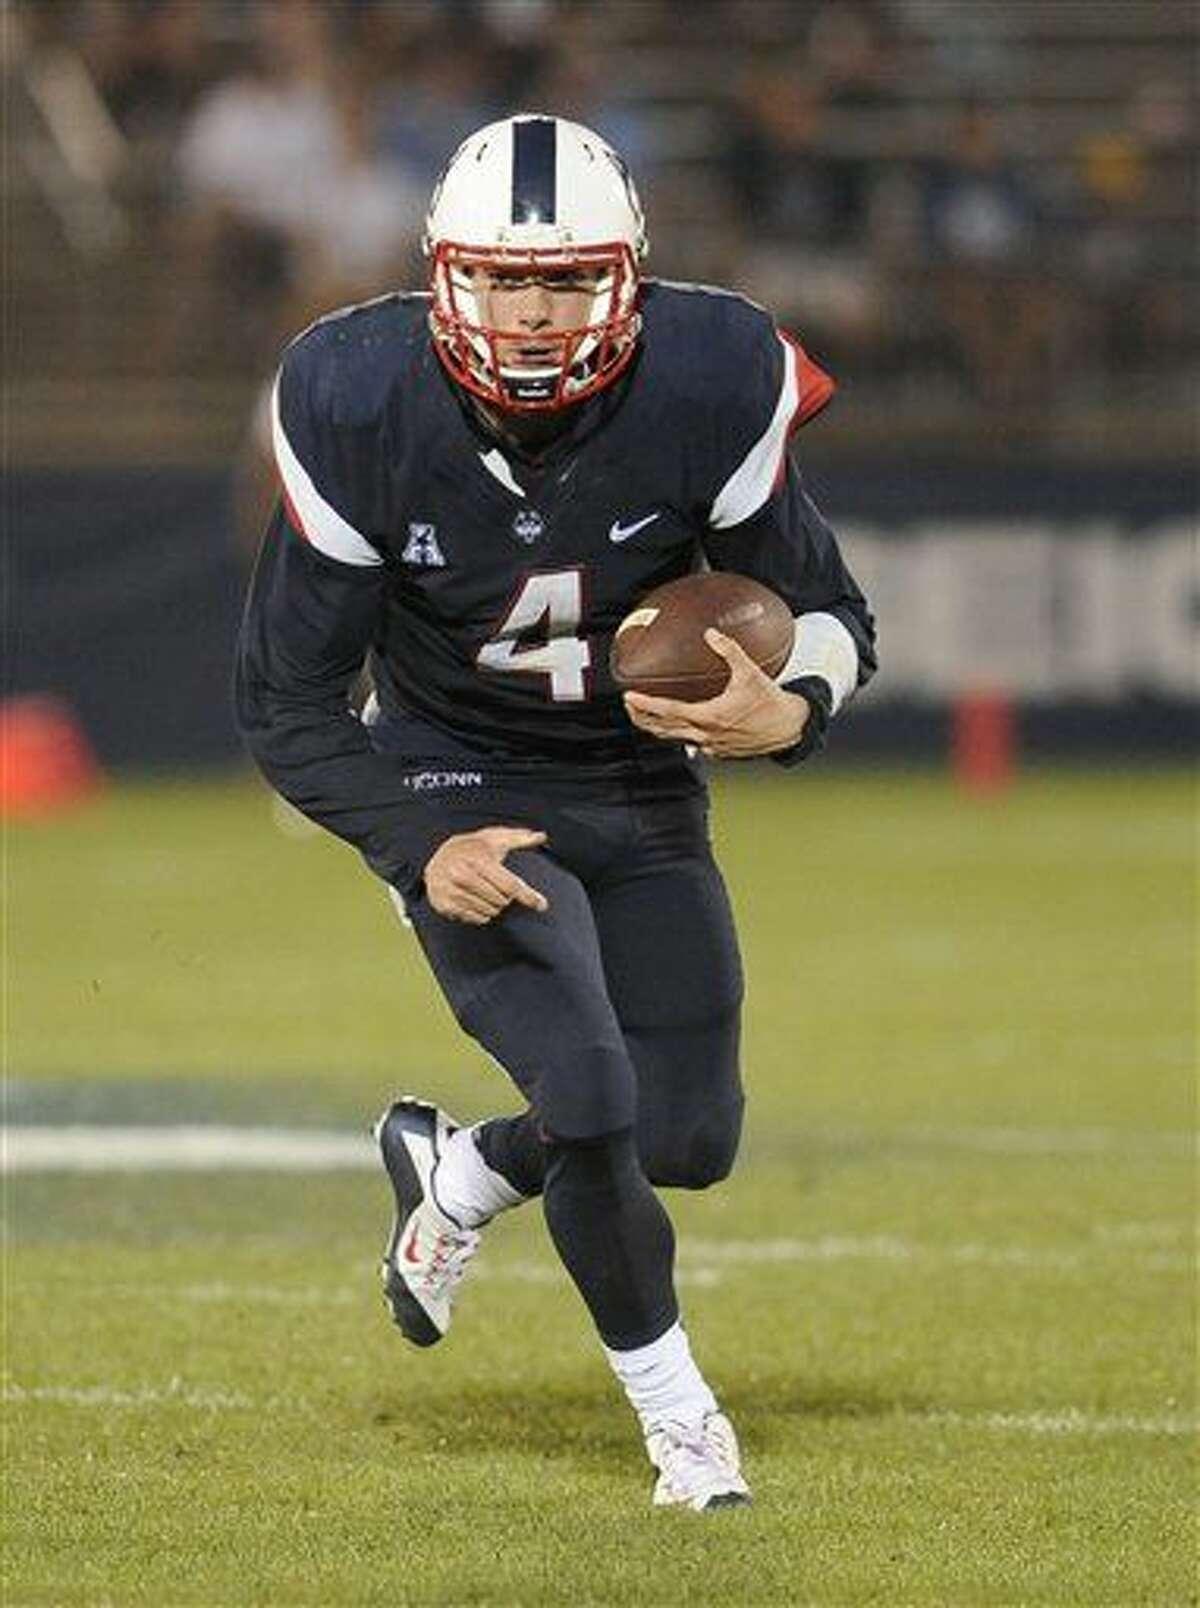 Connecticut quarterback Bryant Shirreffs (4) during the second half of an NCAA college football game at Pratt & Whitney Stadium at Rentschler Field against Villanova, Thursday, Sept. 3, 2015, in East Hartford, Conn. UConn won 20-15. (AP Photo/Jessica Hill)